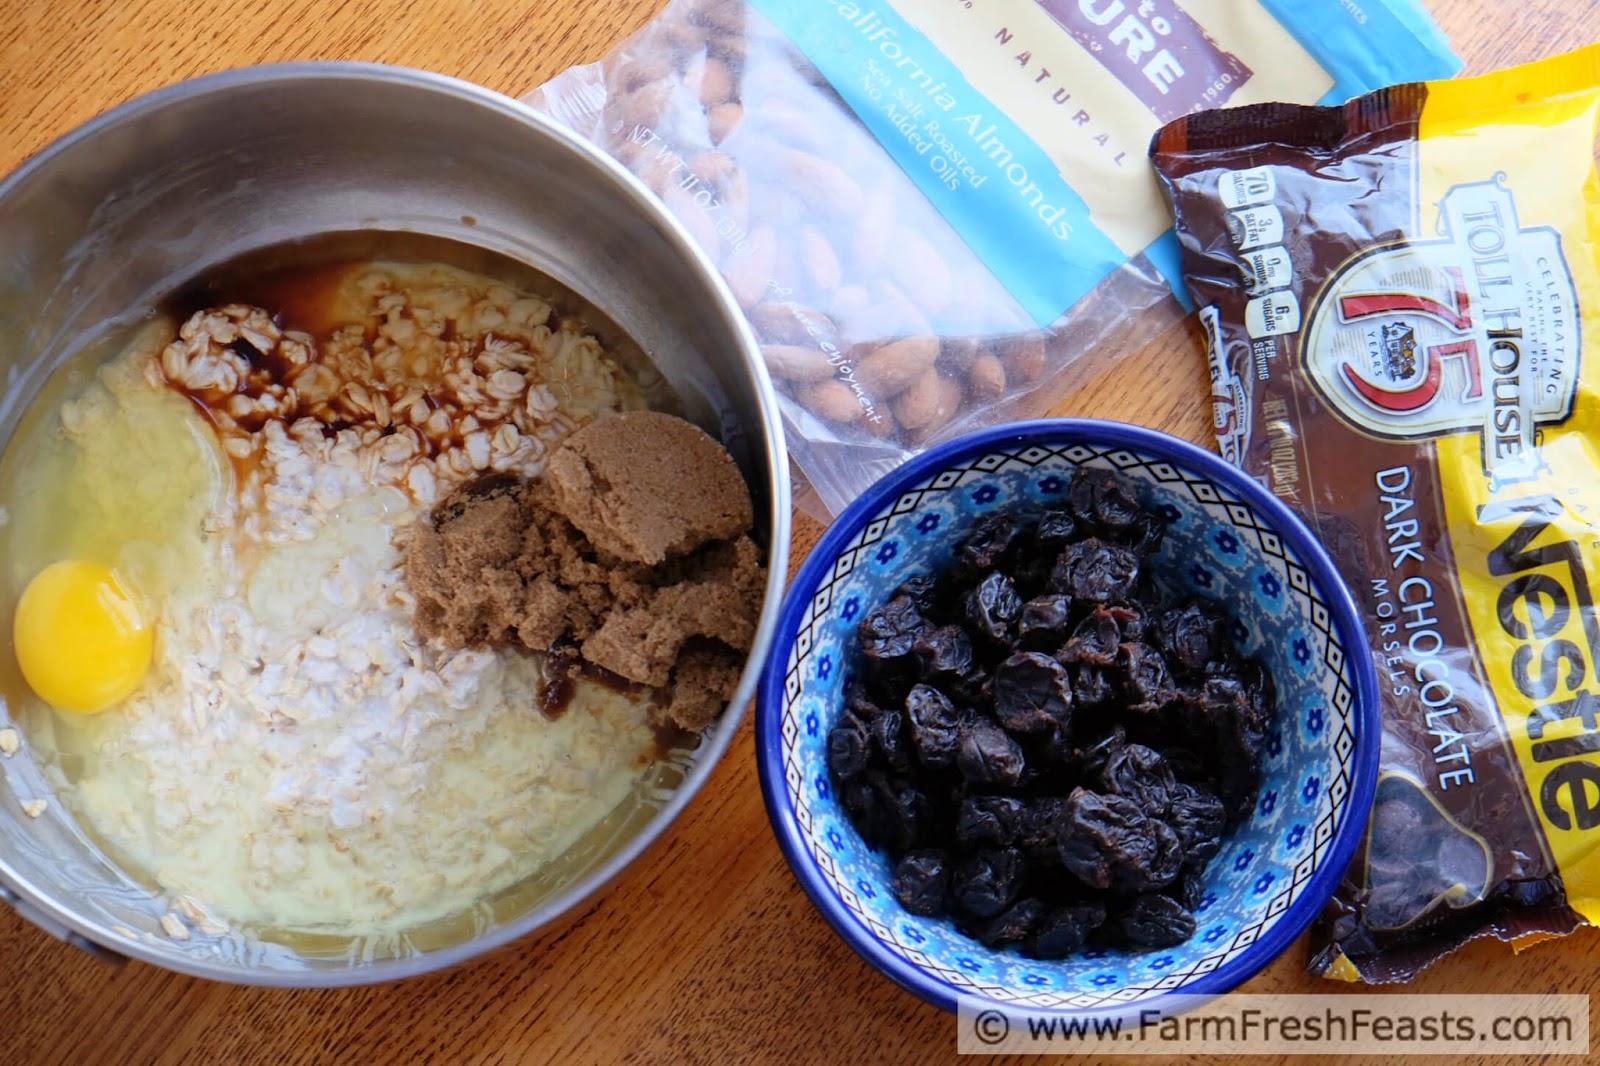 http://www.farmfreshfeasts.com/2015/04/dark-chocolate-cherry-trail-mix-muffins.html